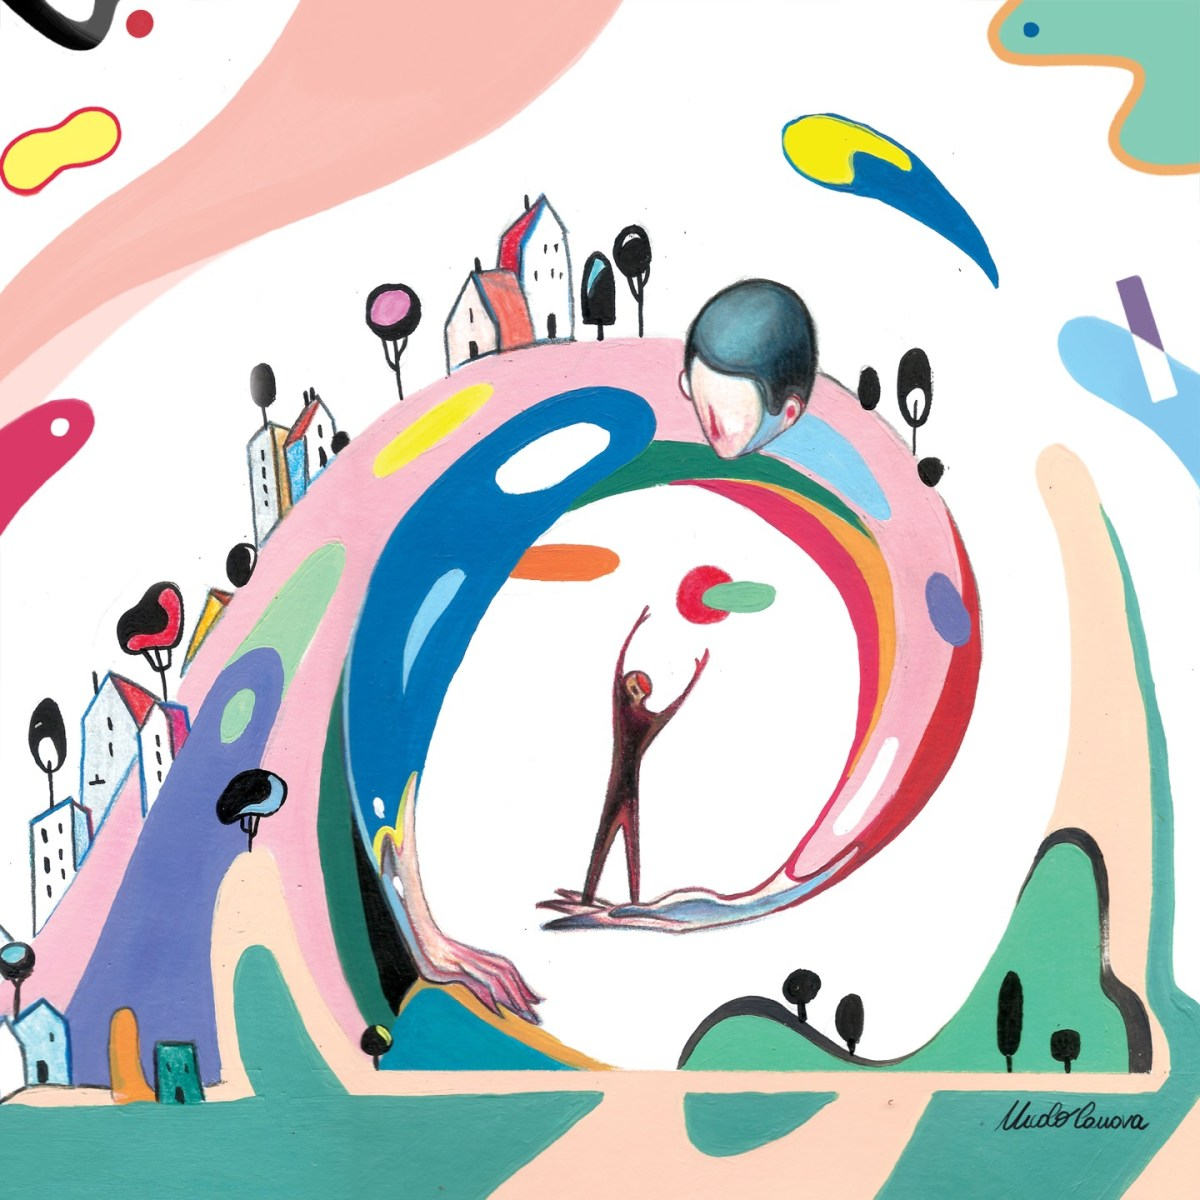 https://i2.wp.com/thesubmarine.it/wp-content/uploads/2019/07/Nicolò-Canova-per-Gomma-Festival-2019.jpg?fit=1200%2C1200&ssl=1